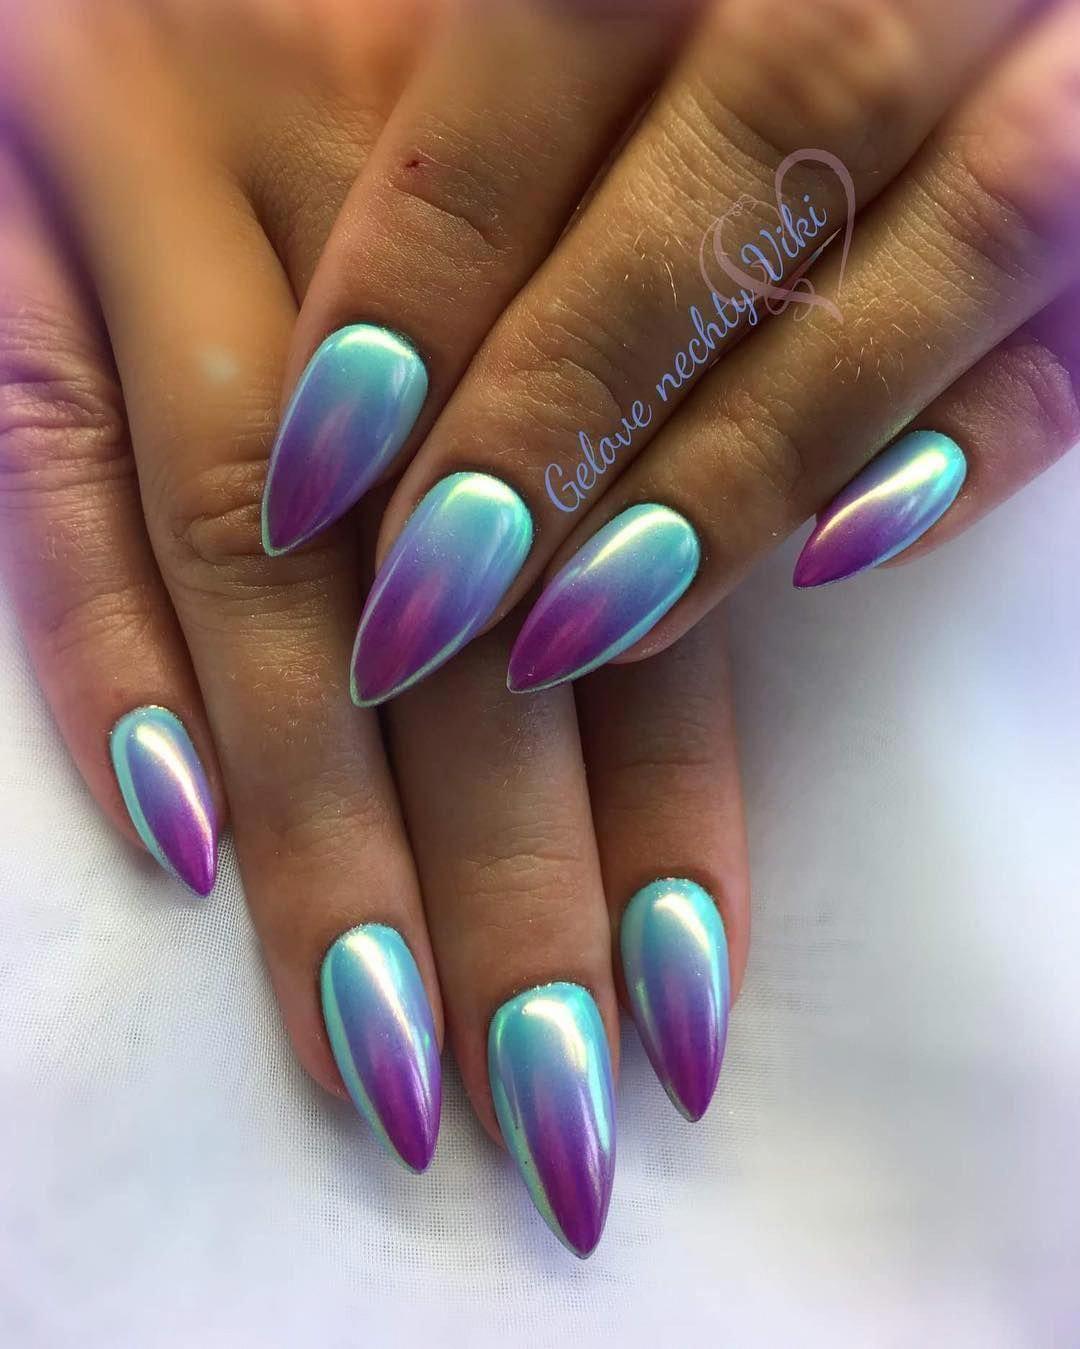 Aurorove Pecky Ombre Z Barev Aruba A Euphoria Zalestena Aurora Nehtomania Www Nehtomania Cz Nails Nailsofthed Ombre Nails Nails Holiday Nails